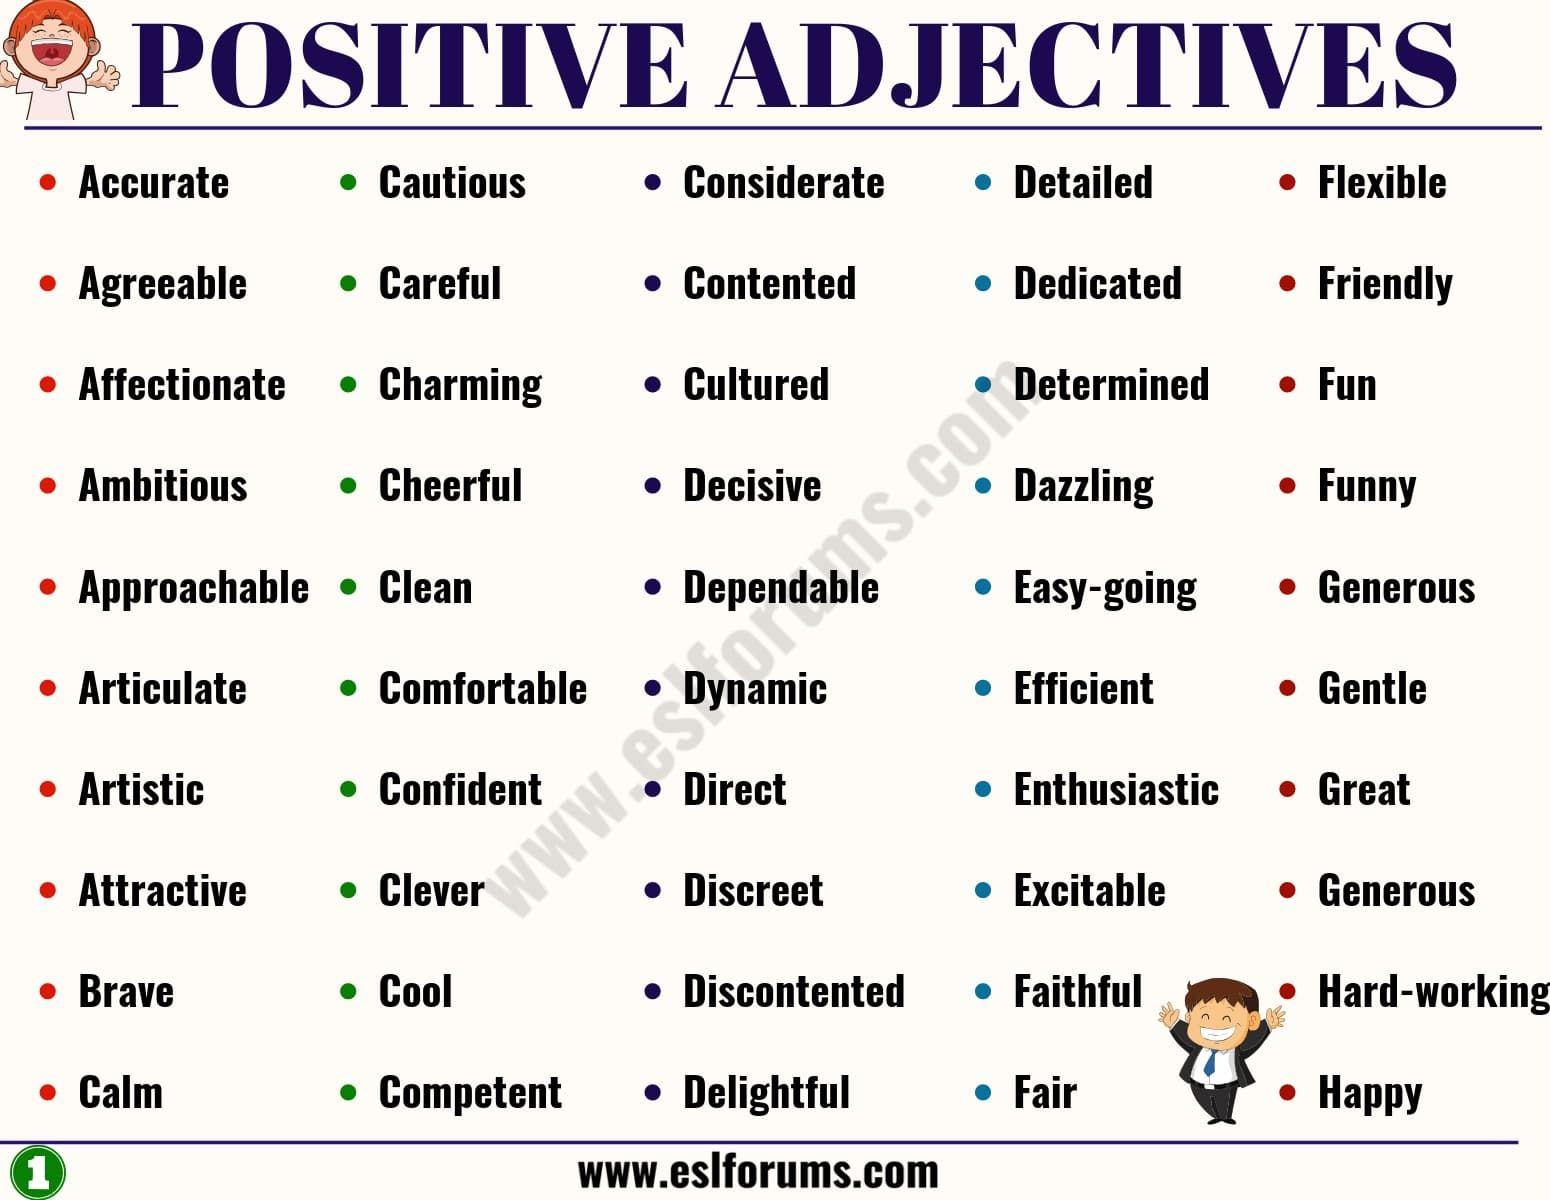 100 Important Positive Adjectives From A Z To Describe A Person Esl Forums Positive Adjectives Words To Describe Someone Describing Words